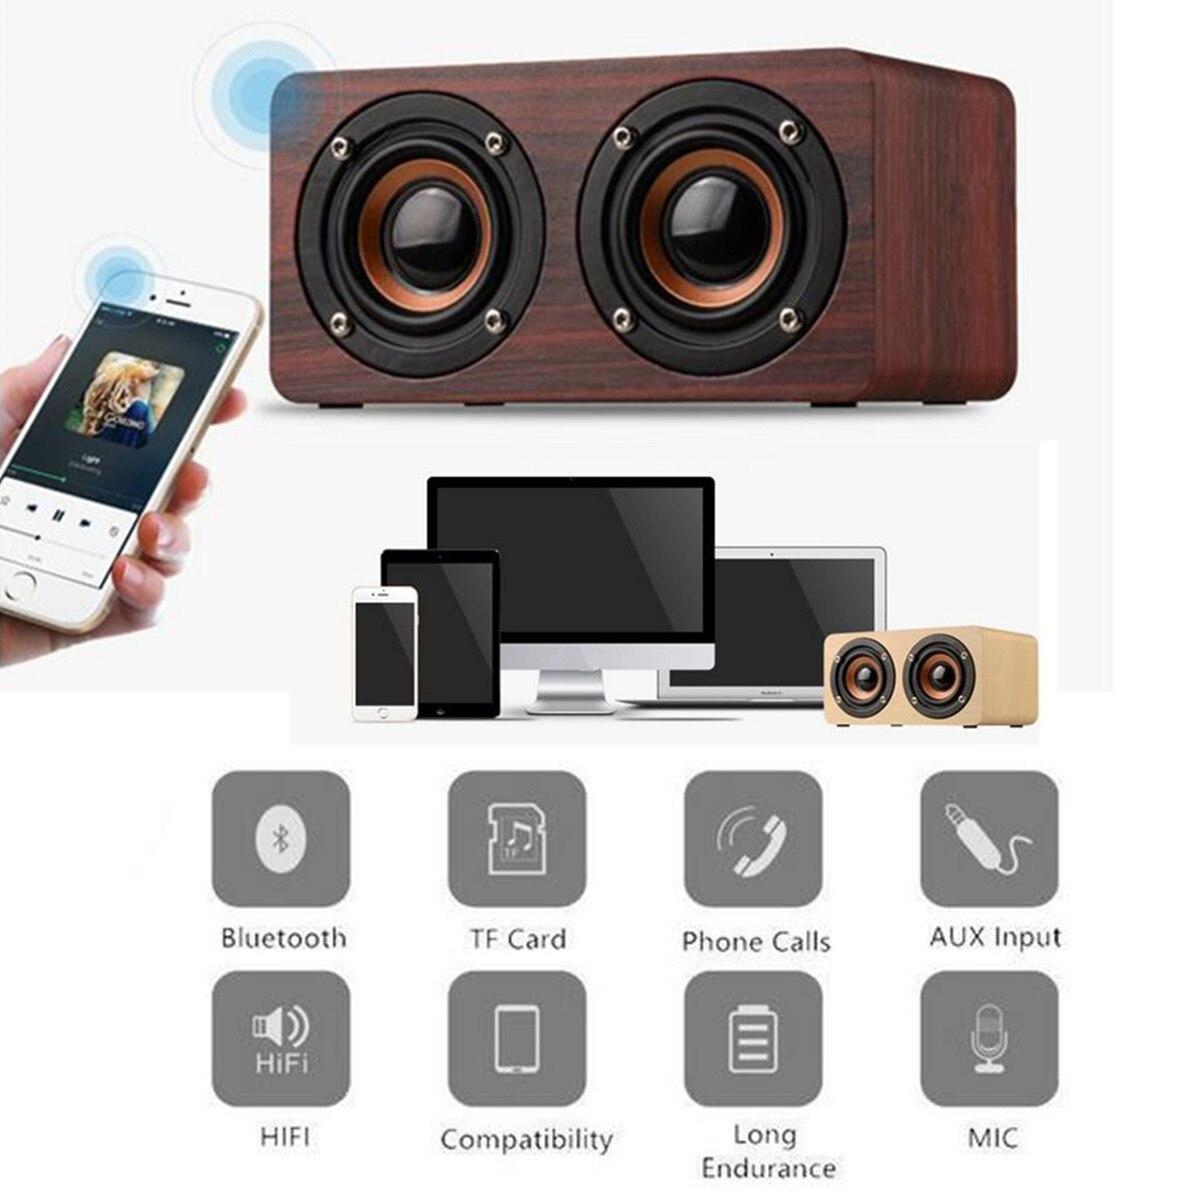 Subwoofer Unterhaltungselektronik 10 W Tragbare Holz Drahtlose Bluetooth Lautsprecher Dual Einheiten W/tf Karte Stereo Bass Lautsprecher Subwoofer